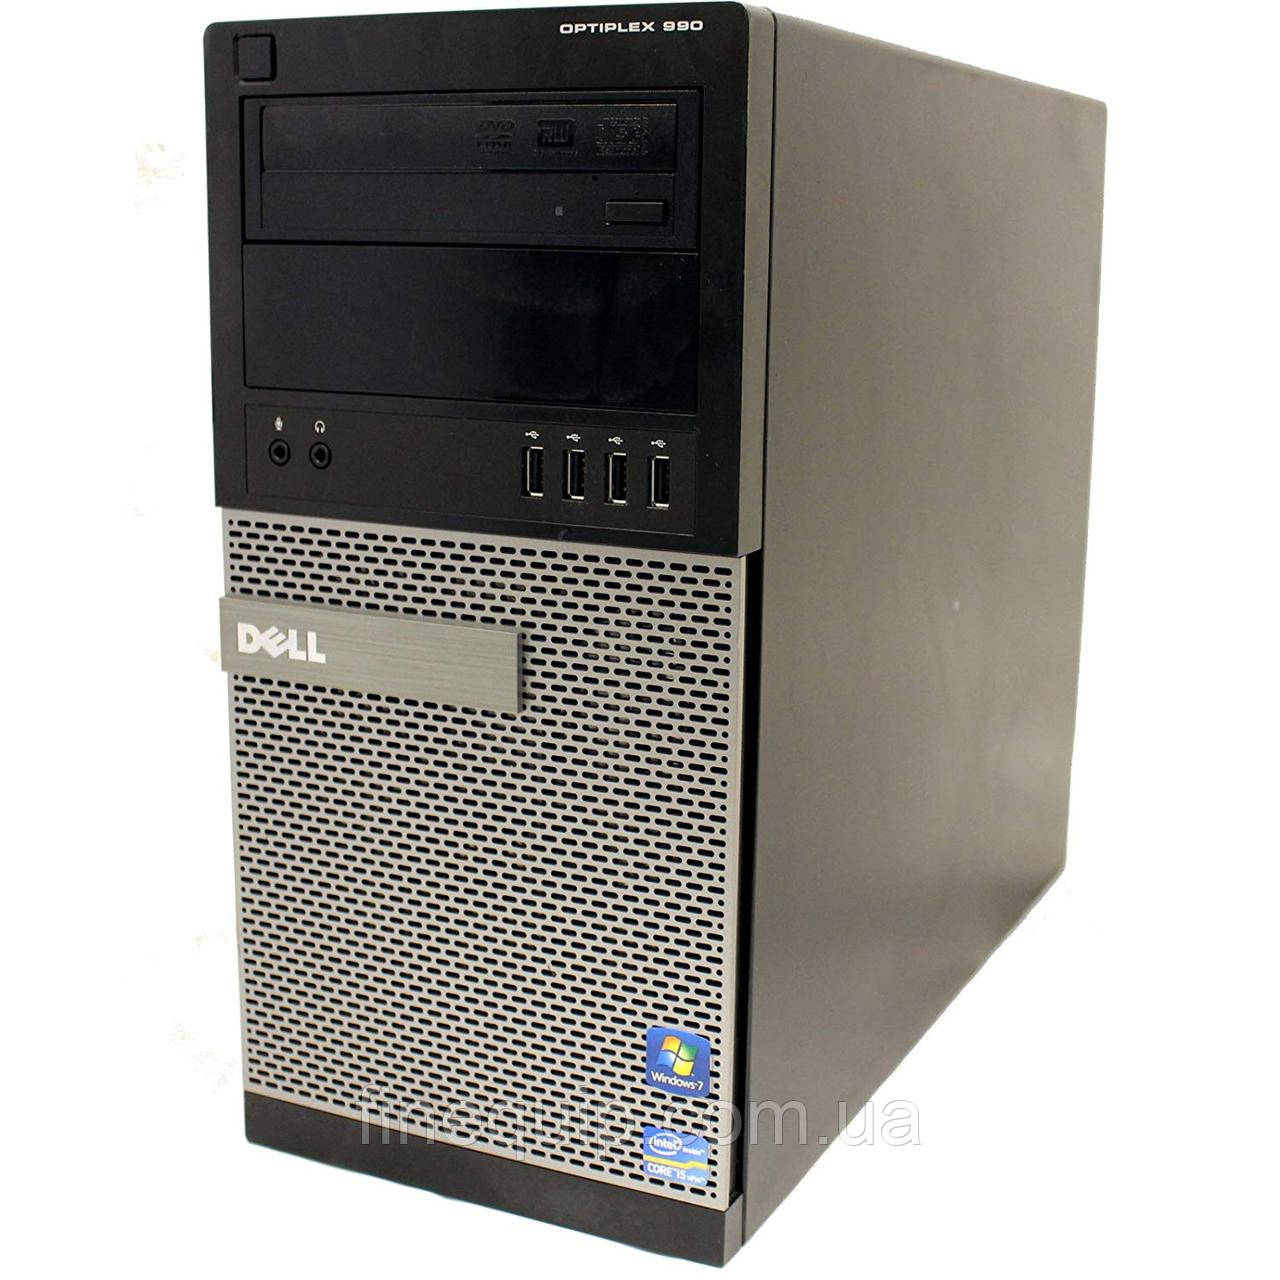 Системный блок Dell Optiplex 990 MiniTower-Intel Core-i5-2400-3,10GHz-8Gb-DDR3-HDD-500Gb- Б/У